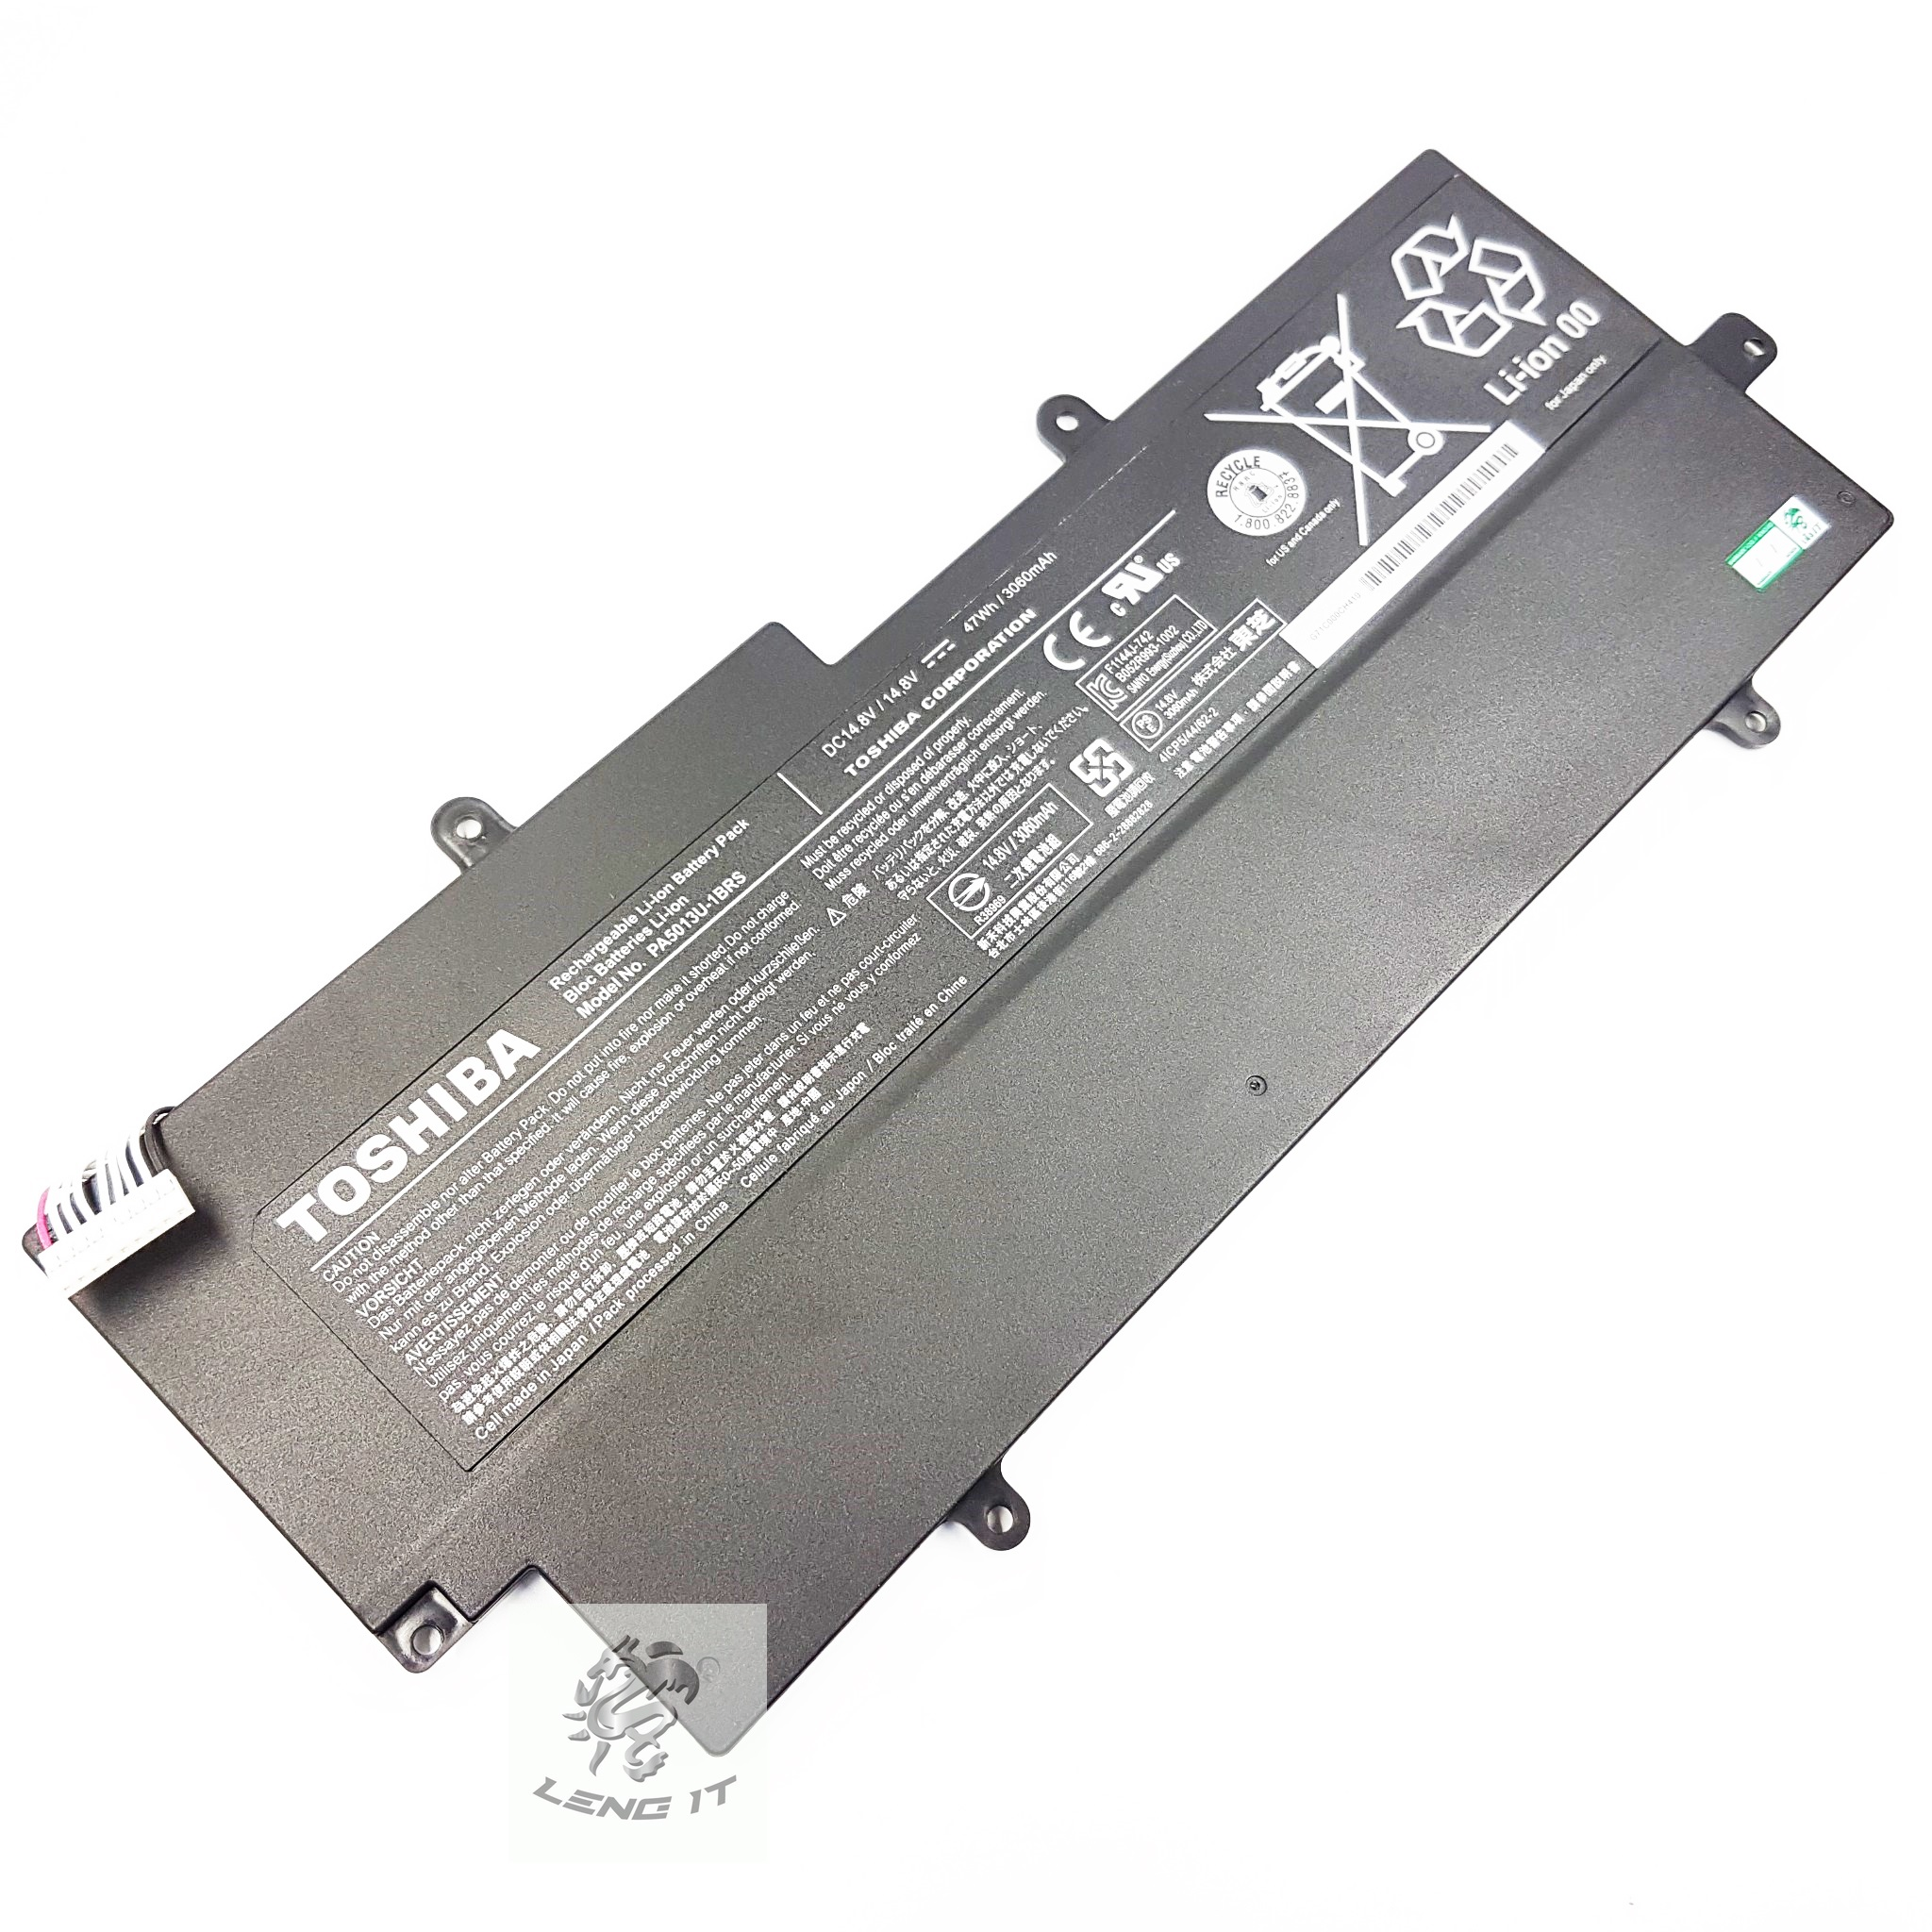 Battery Toshiba Z830